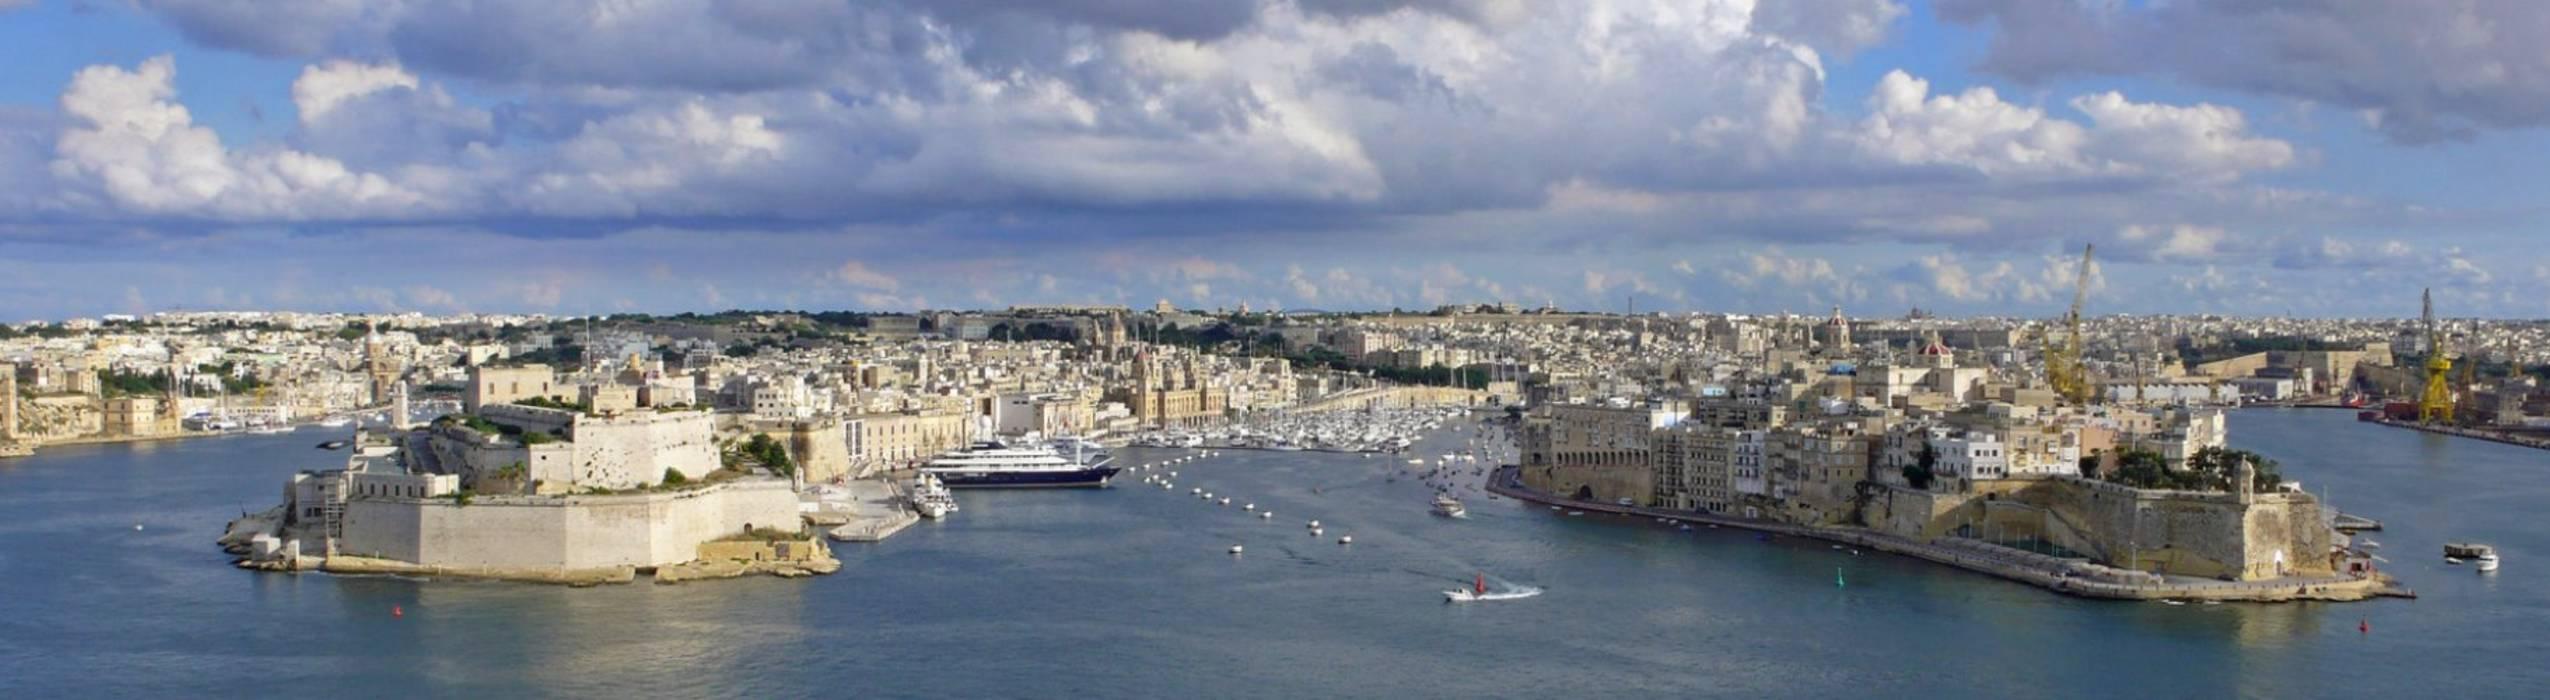 Yachtcharter Malta